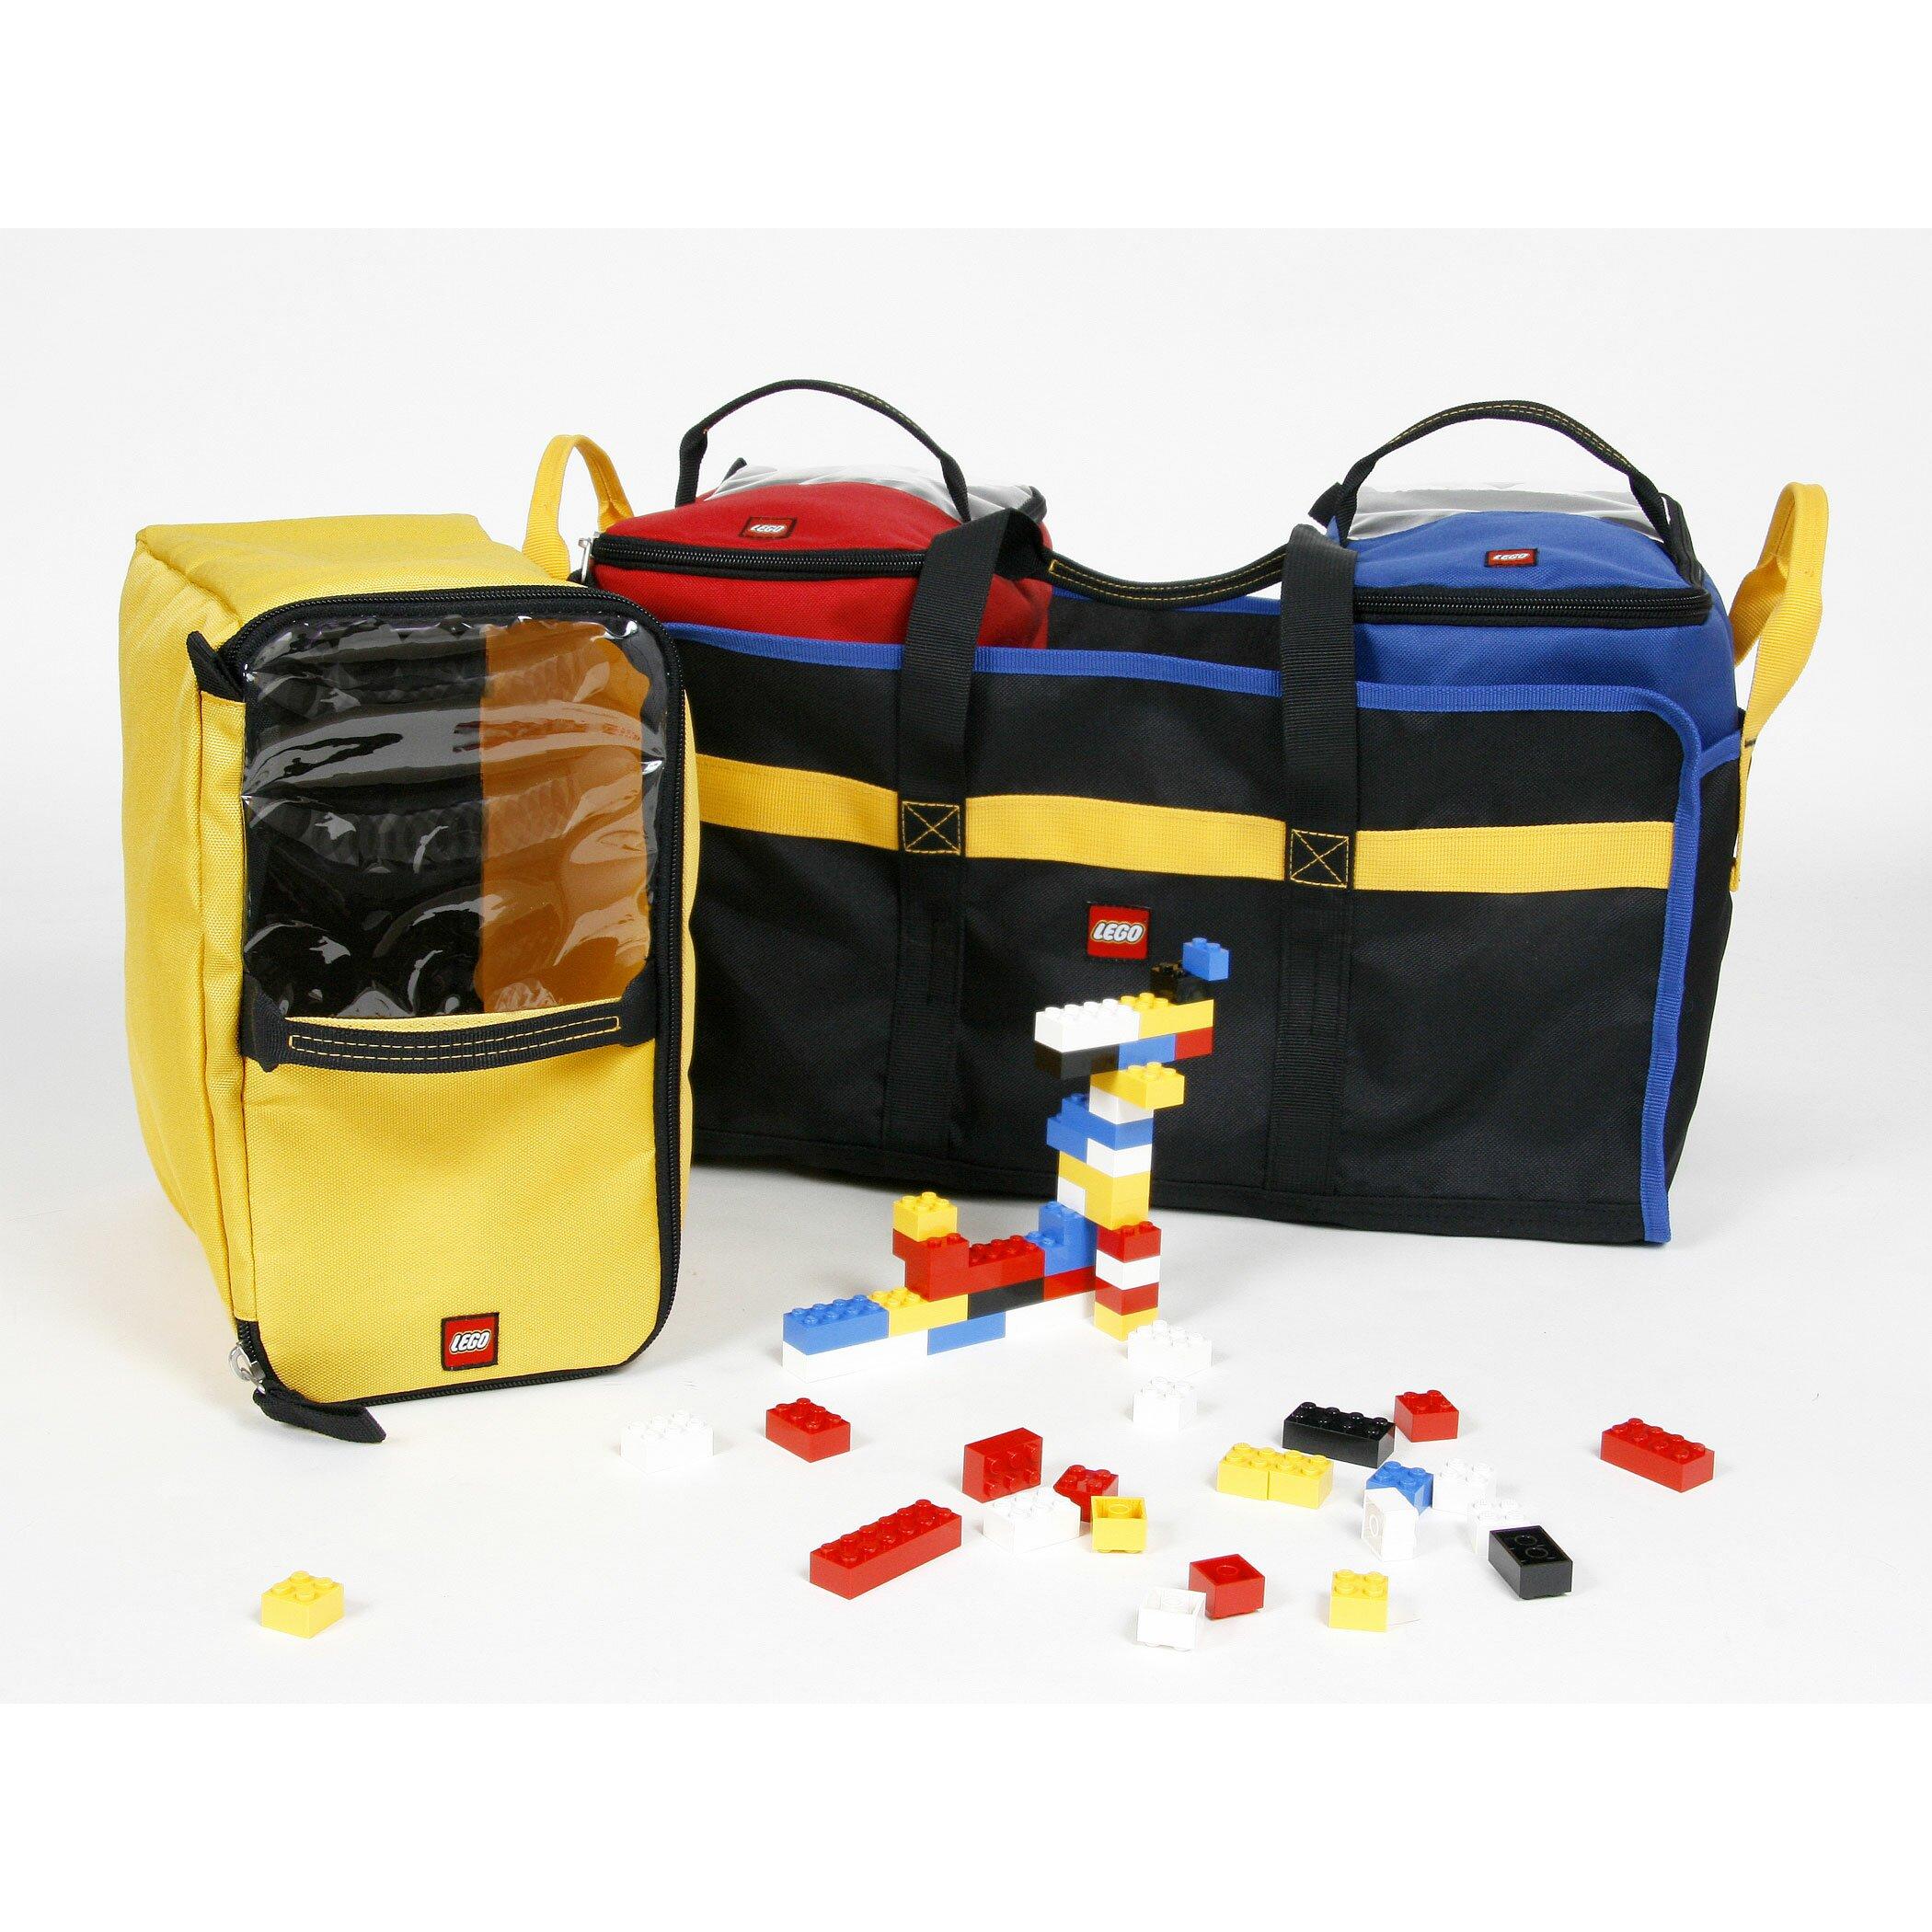 LEGO Luggage 4-Piece Toy Organizer Tote & Reviews | Wayfair